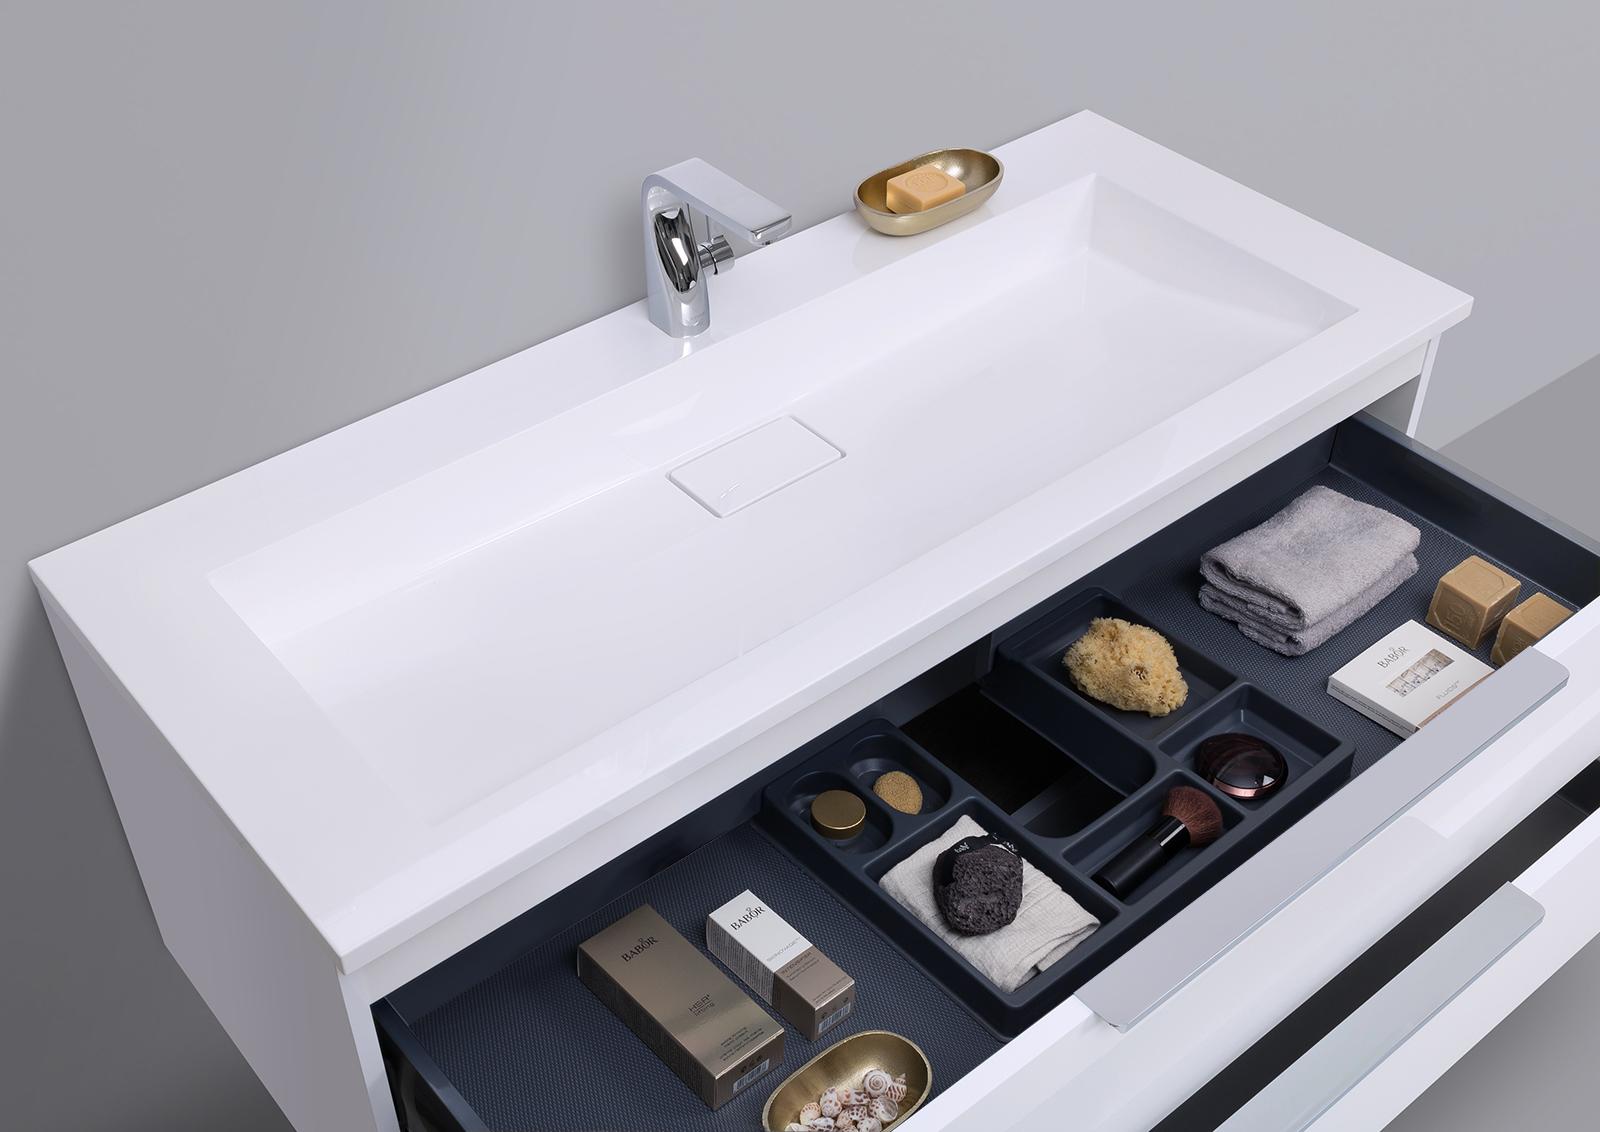 badm bel set cubo 120 cm evermite waschtisch mit led. Black Bedroom Furniture Sets. Home Design Ideas